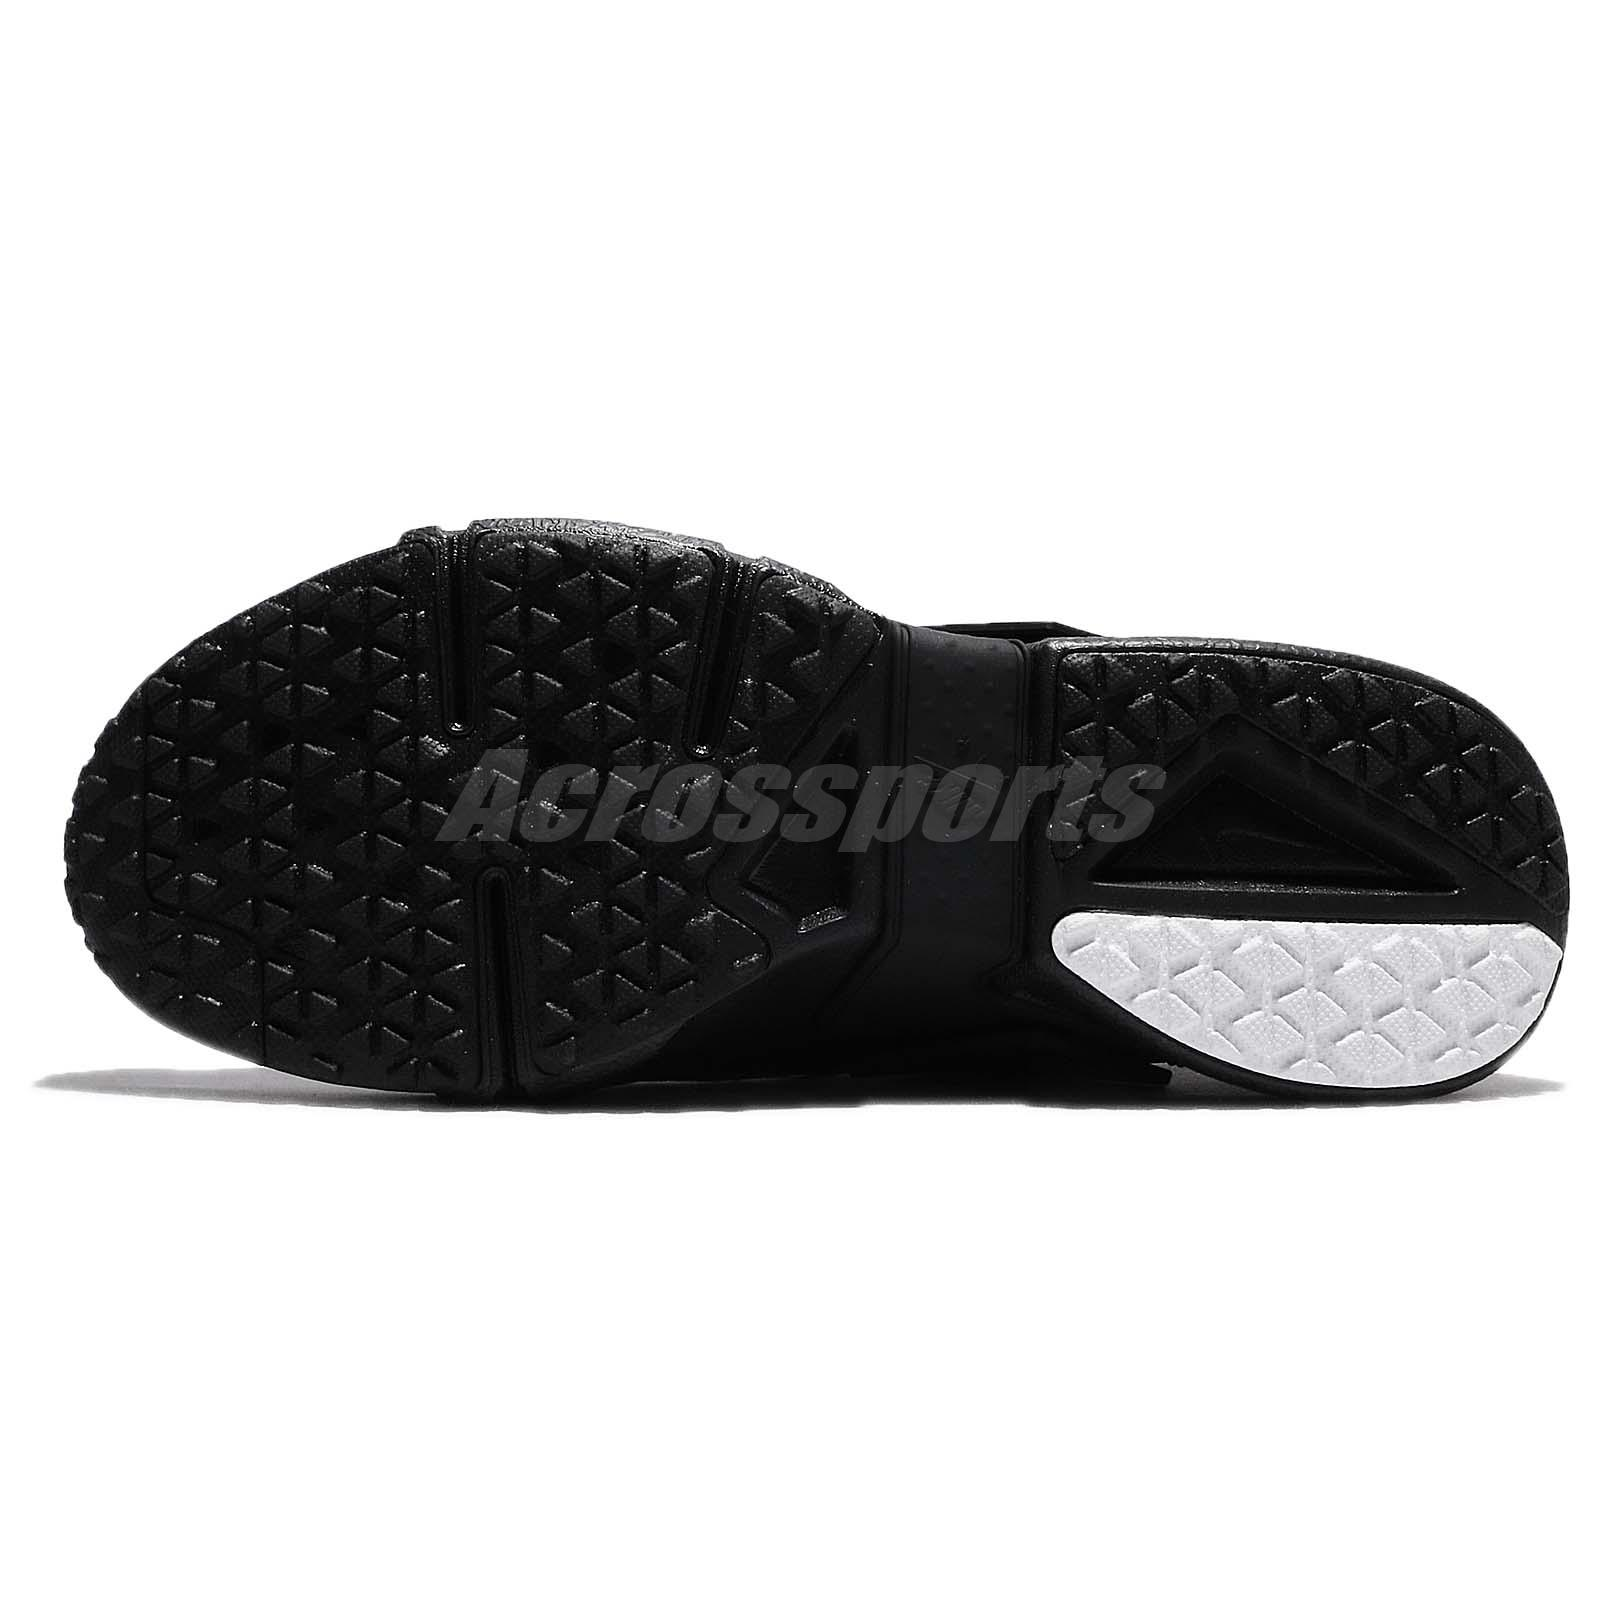 Nike Air Huarache Drift PRM Black Anthracite Men Running Shoe ... 28ab2215921